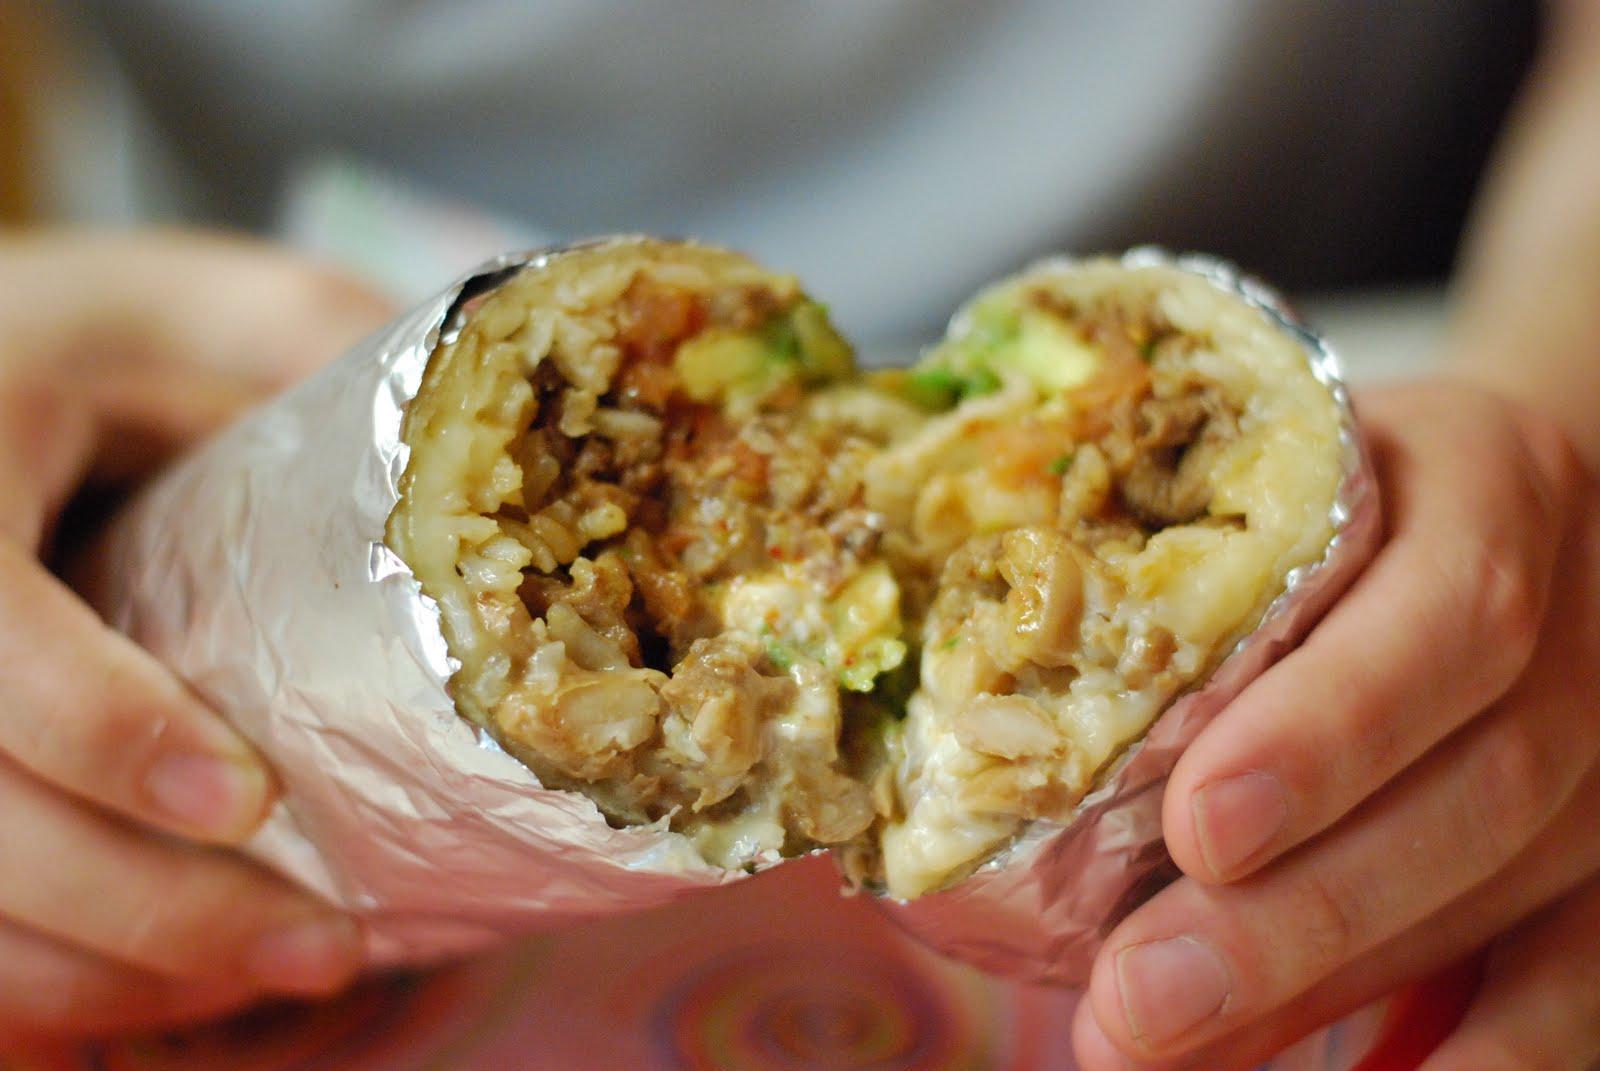 Super carne asada burrito el farolito taqueria photo credit kendra